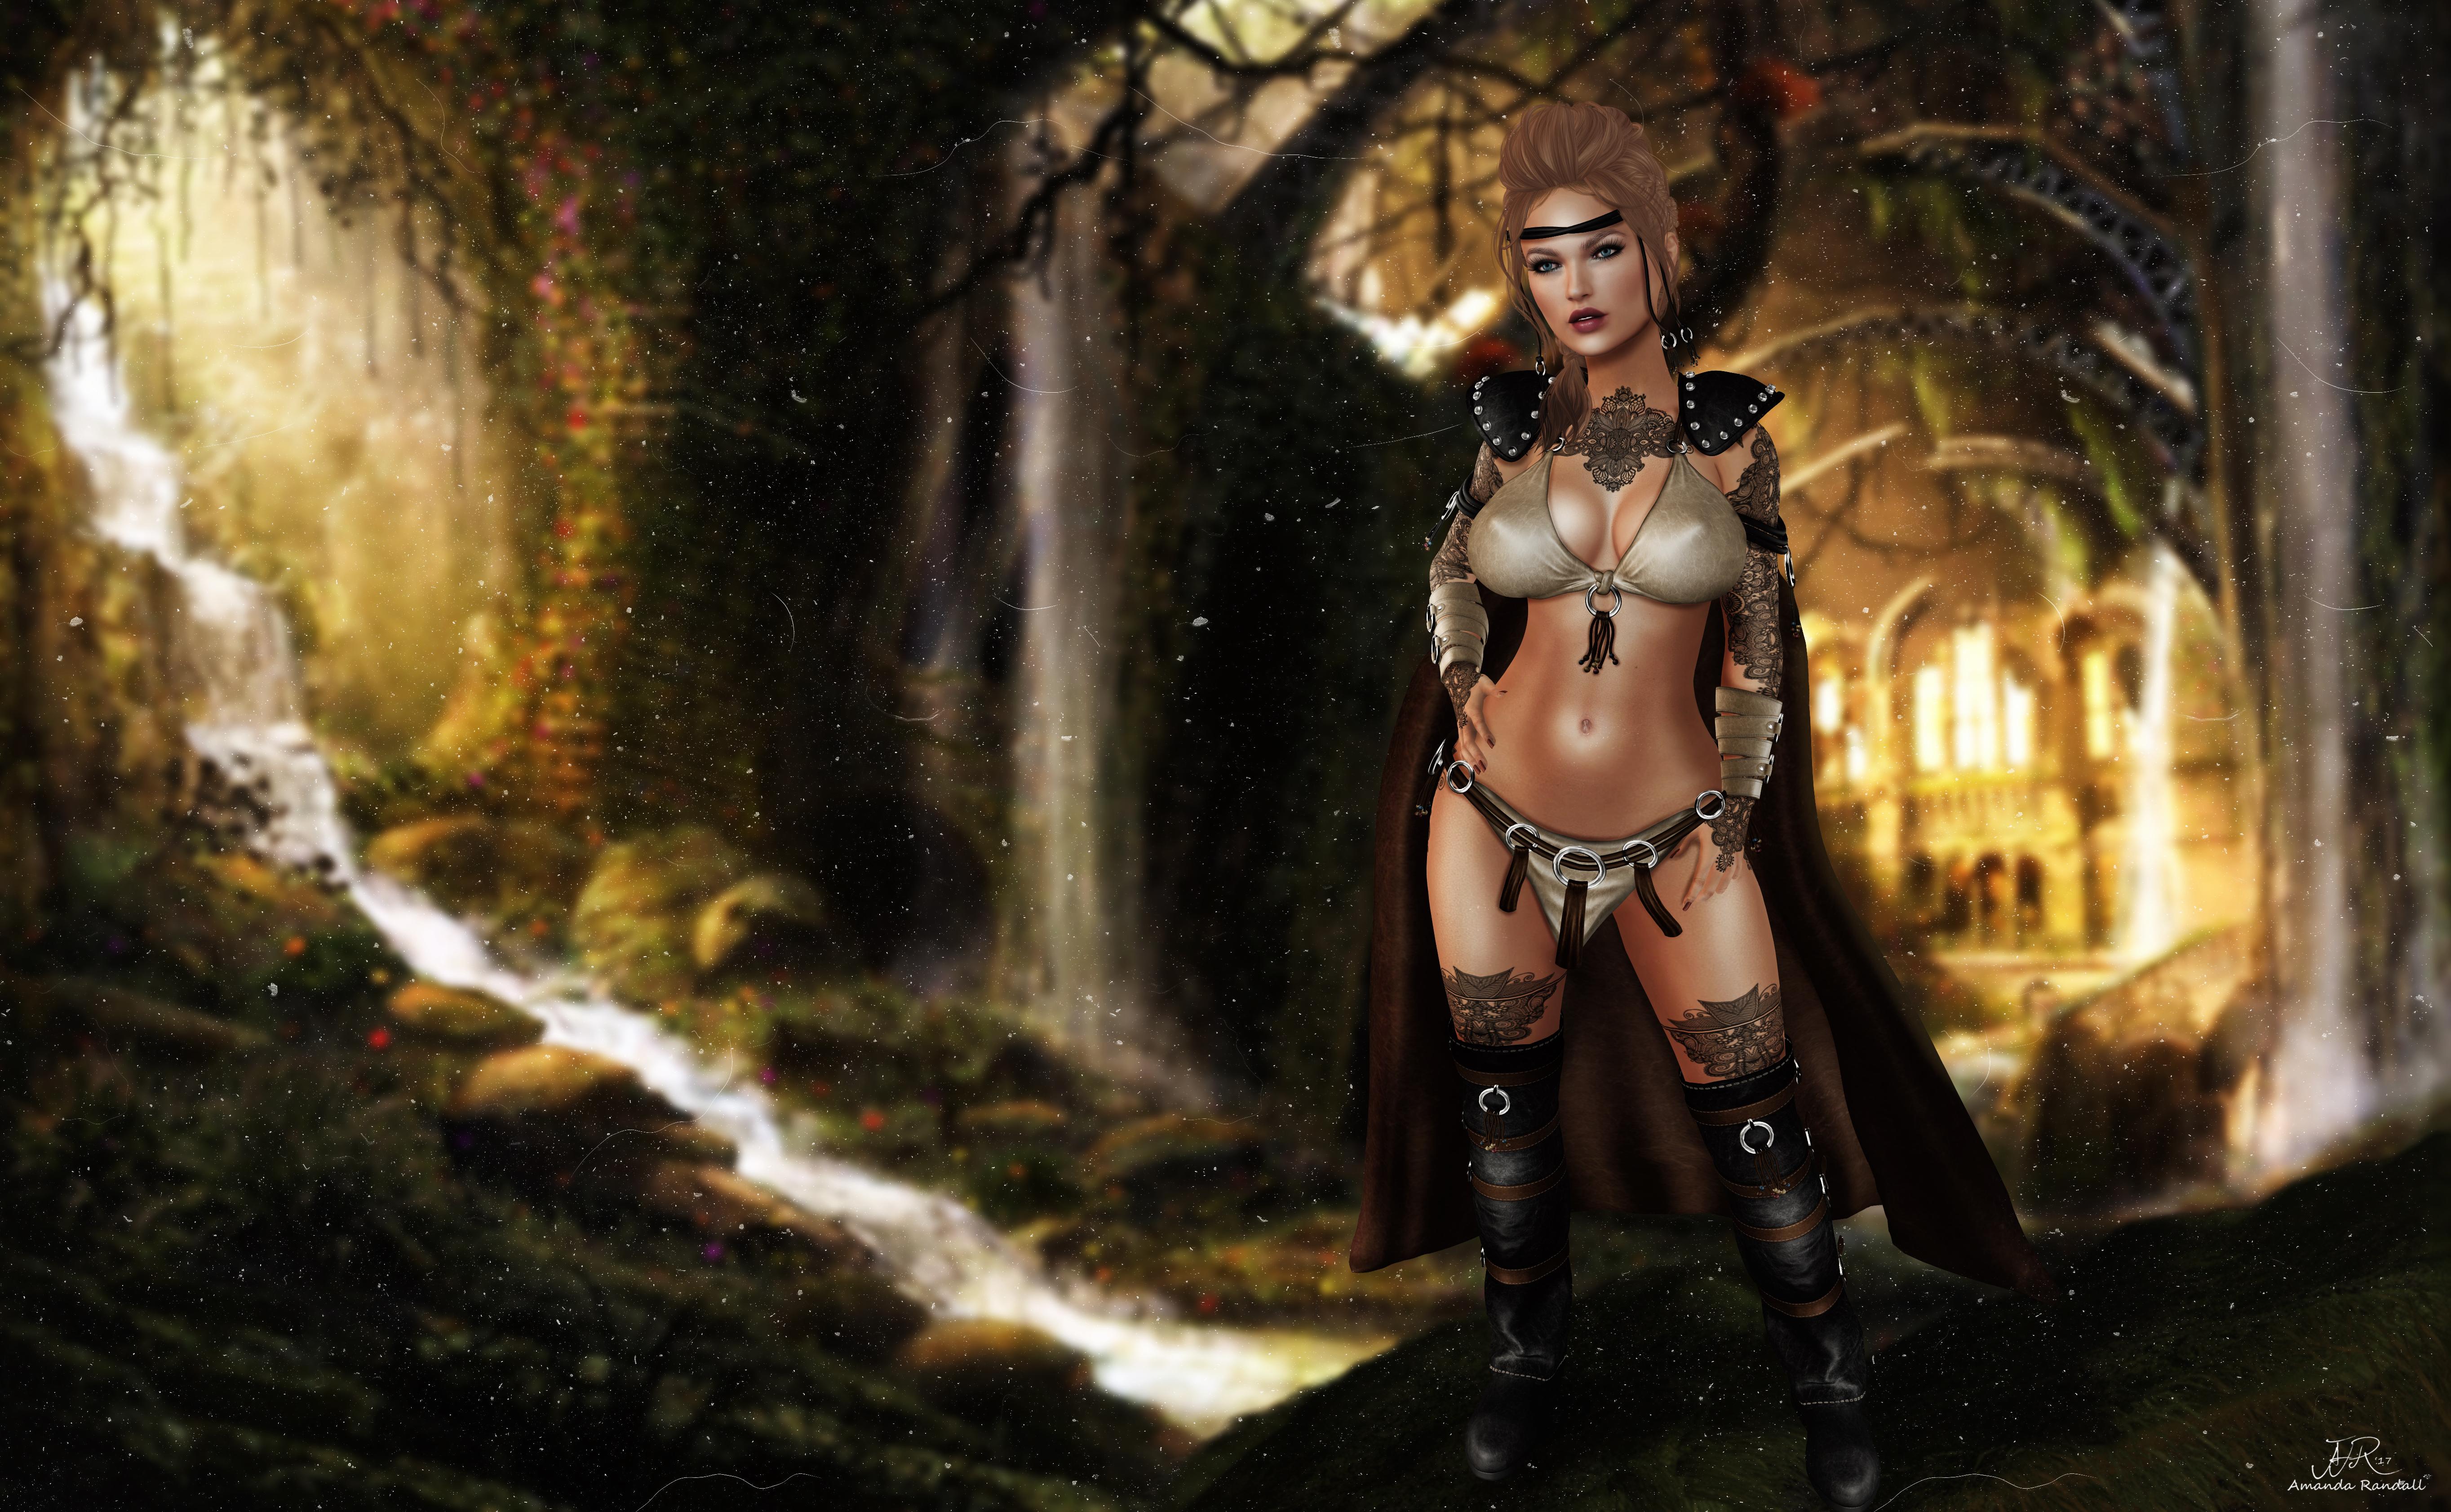 Wallpaper : model, tattoo, fashion, hair, boots, jungle